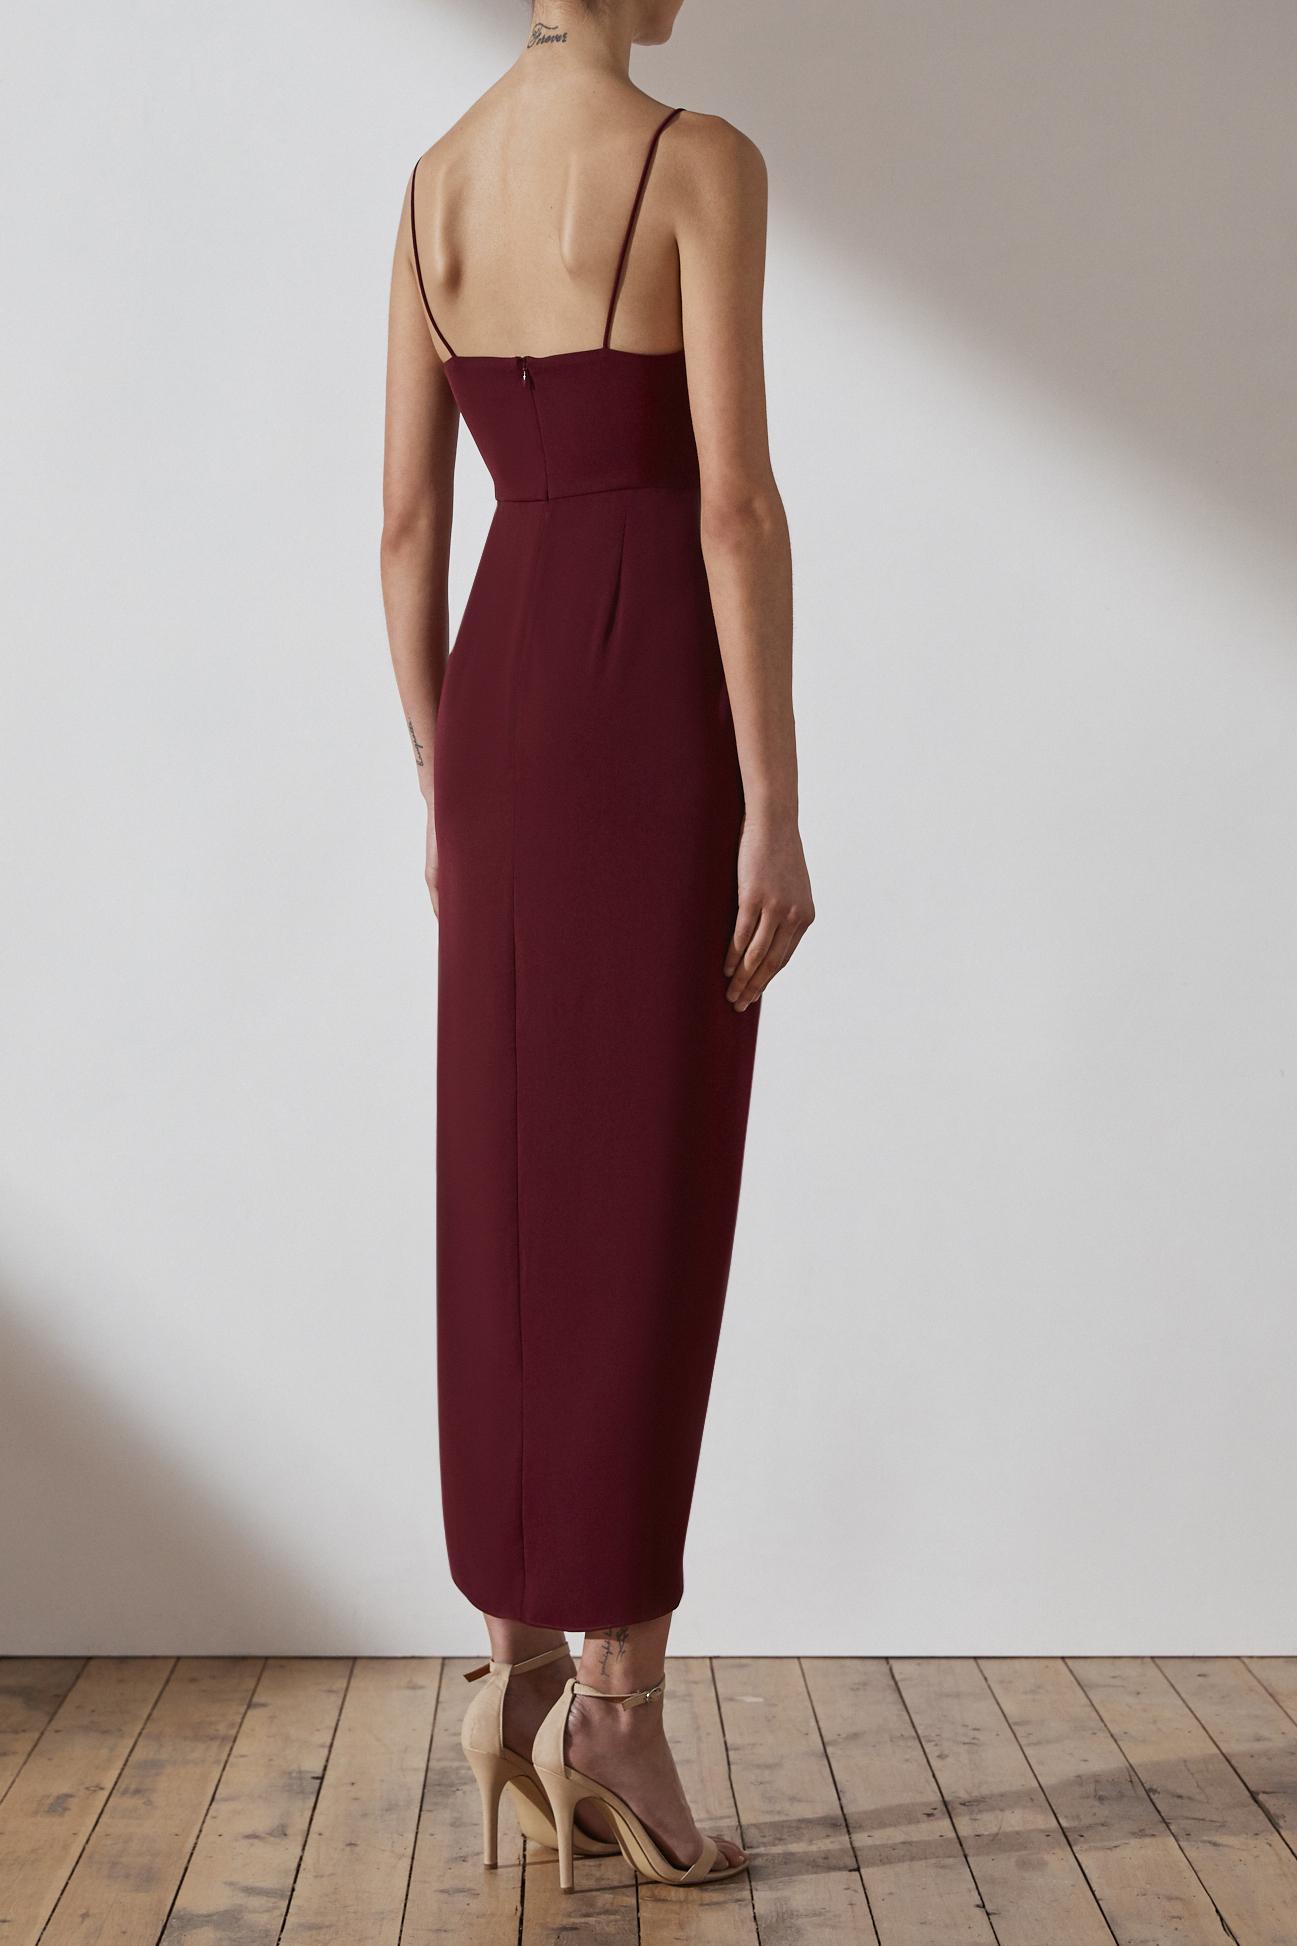 Shona Joy Samantha Bridesmaids Dress